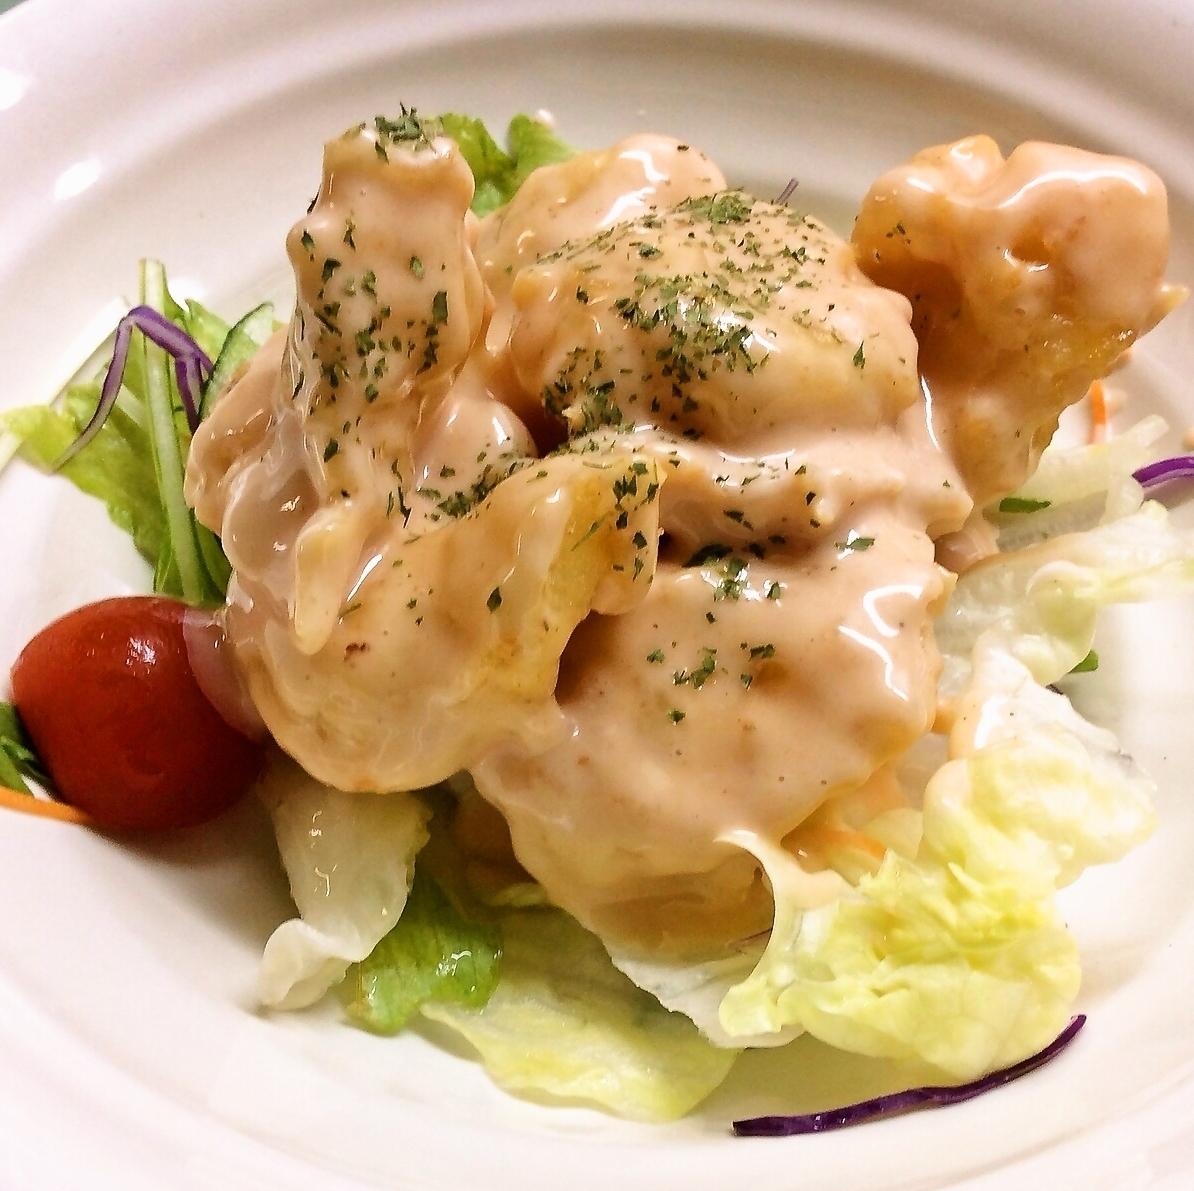 Shrimp mayo / shrimp chili sauce / Stir-fried pork and garlic sprouts